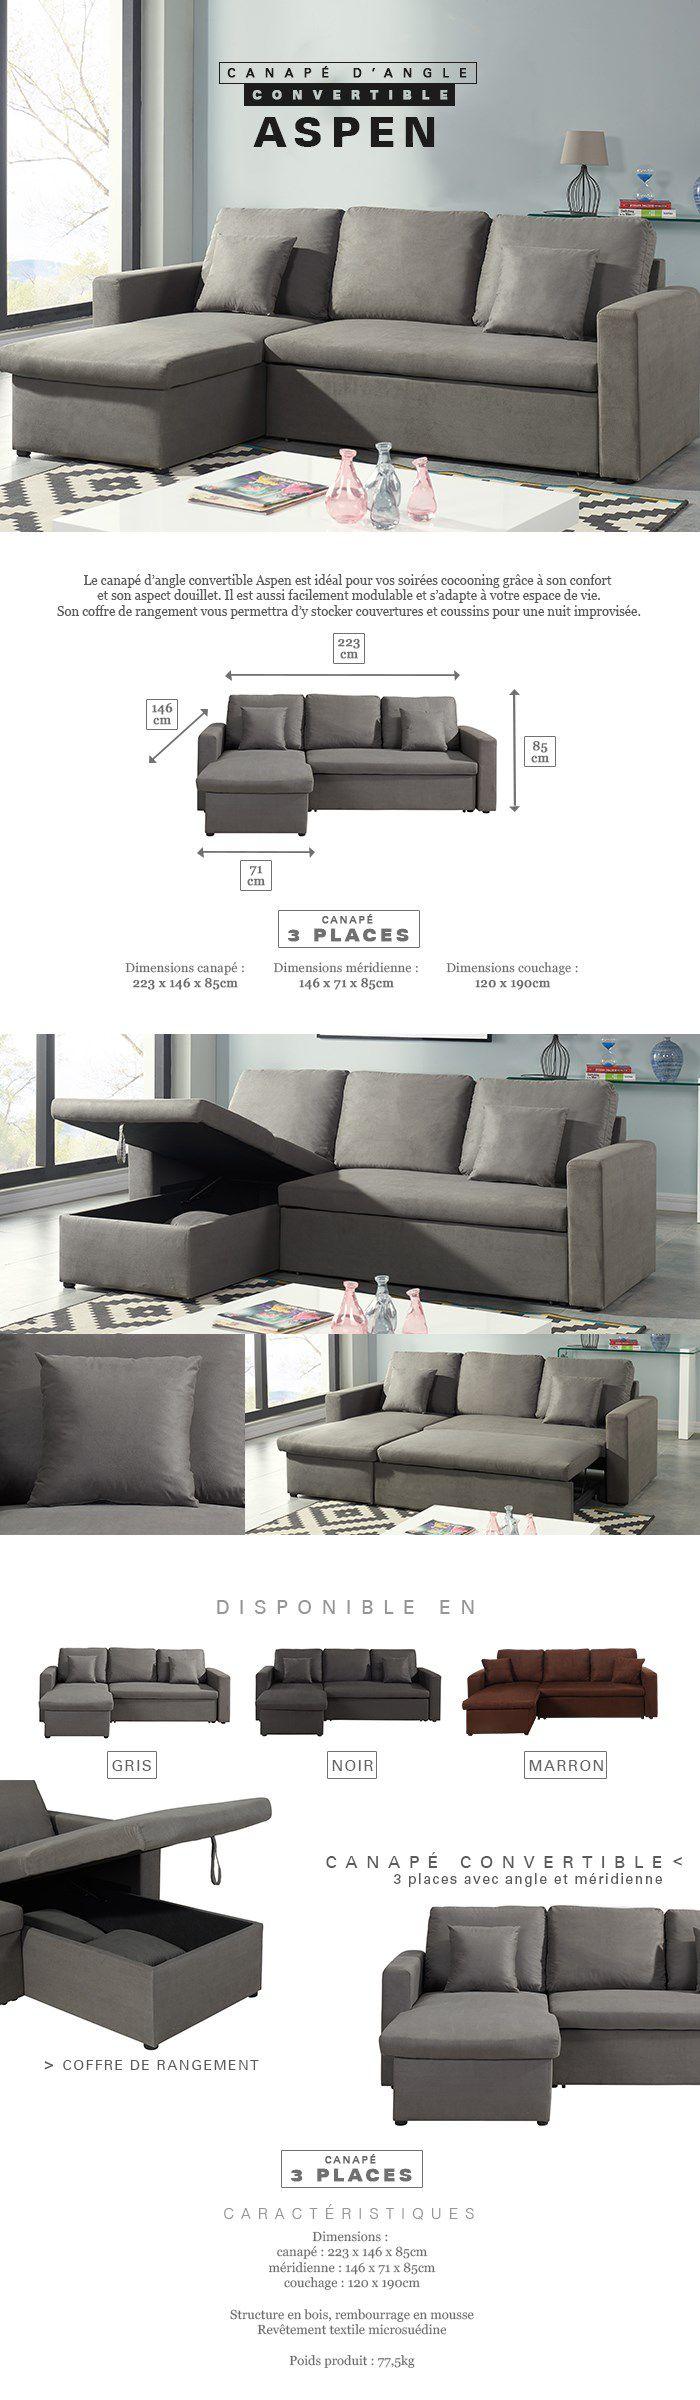 aspen canap d 39 angle r versible convertible 3 places tissu gris contemporain l 223 x p 146. Black Bedroom Furniture Sets. Home Design Ideas